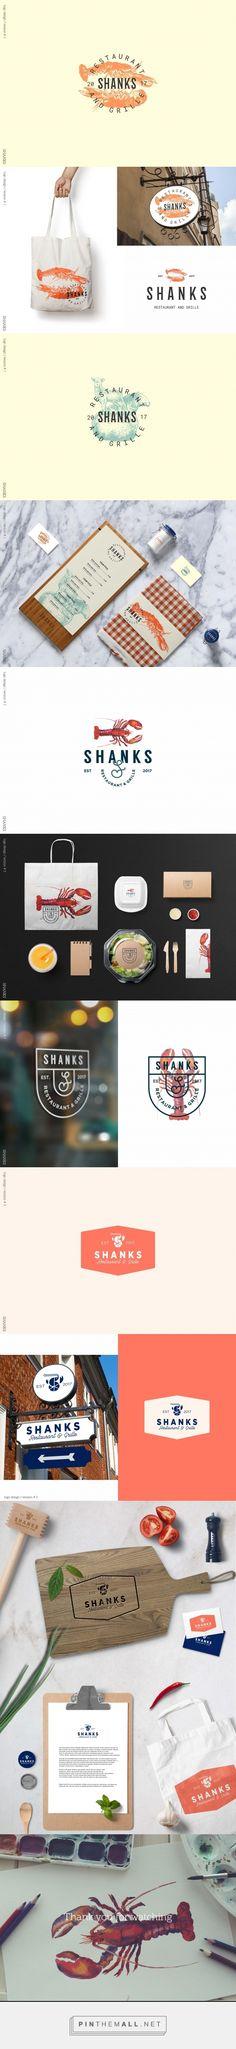 Shanks Restaurant and Grille Branding Concepts by Fivestar Branding Agency | Fivestar Branding Agency – Design and Branding Agency & Curated Inspiration Gallery  #restaurantbranding #branding #brand #design #logo #designinspiration